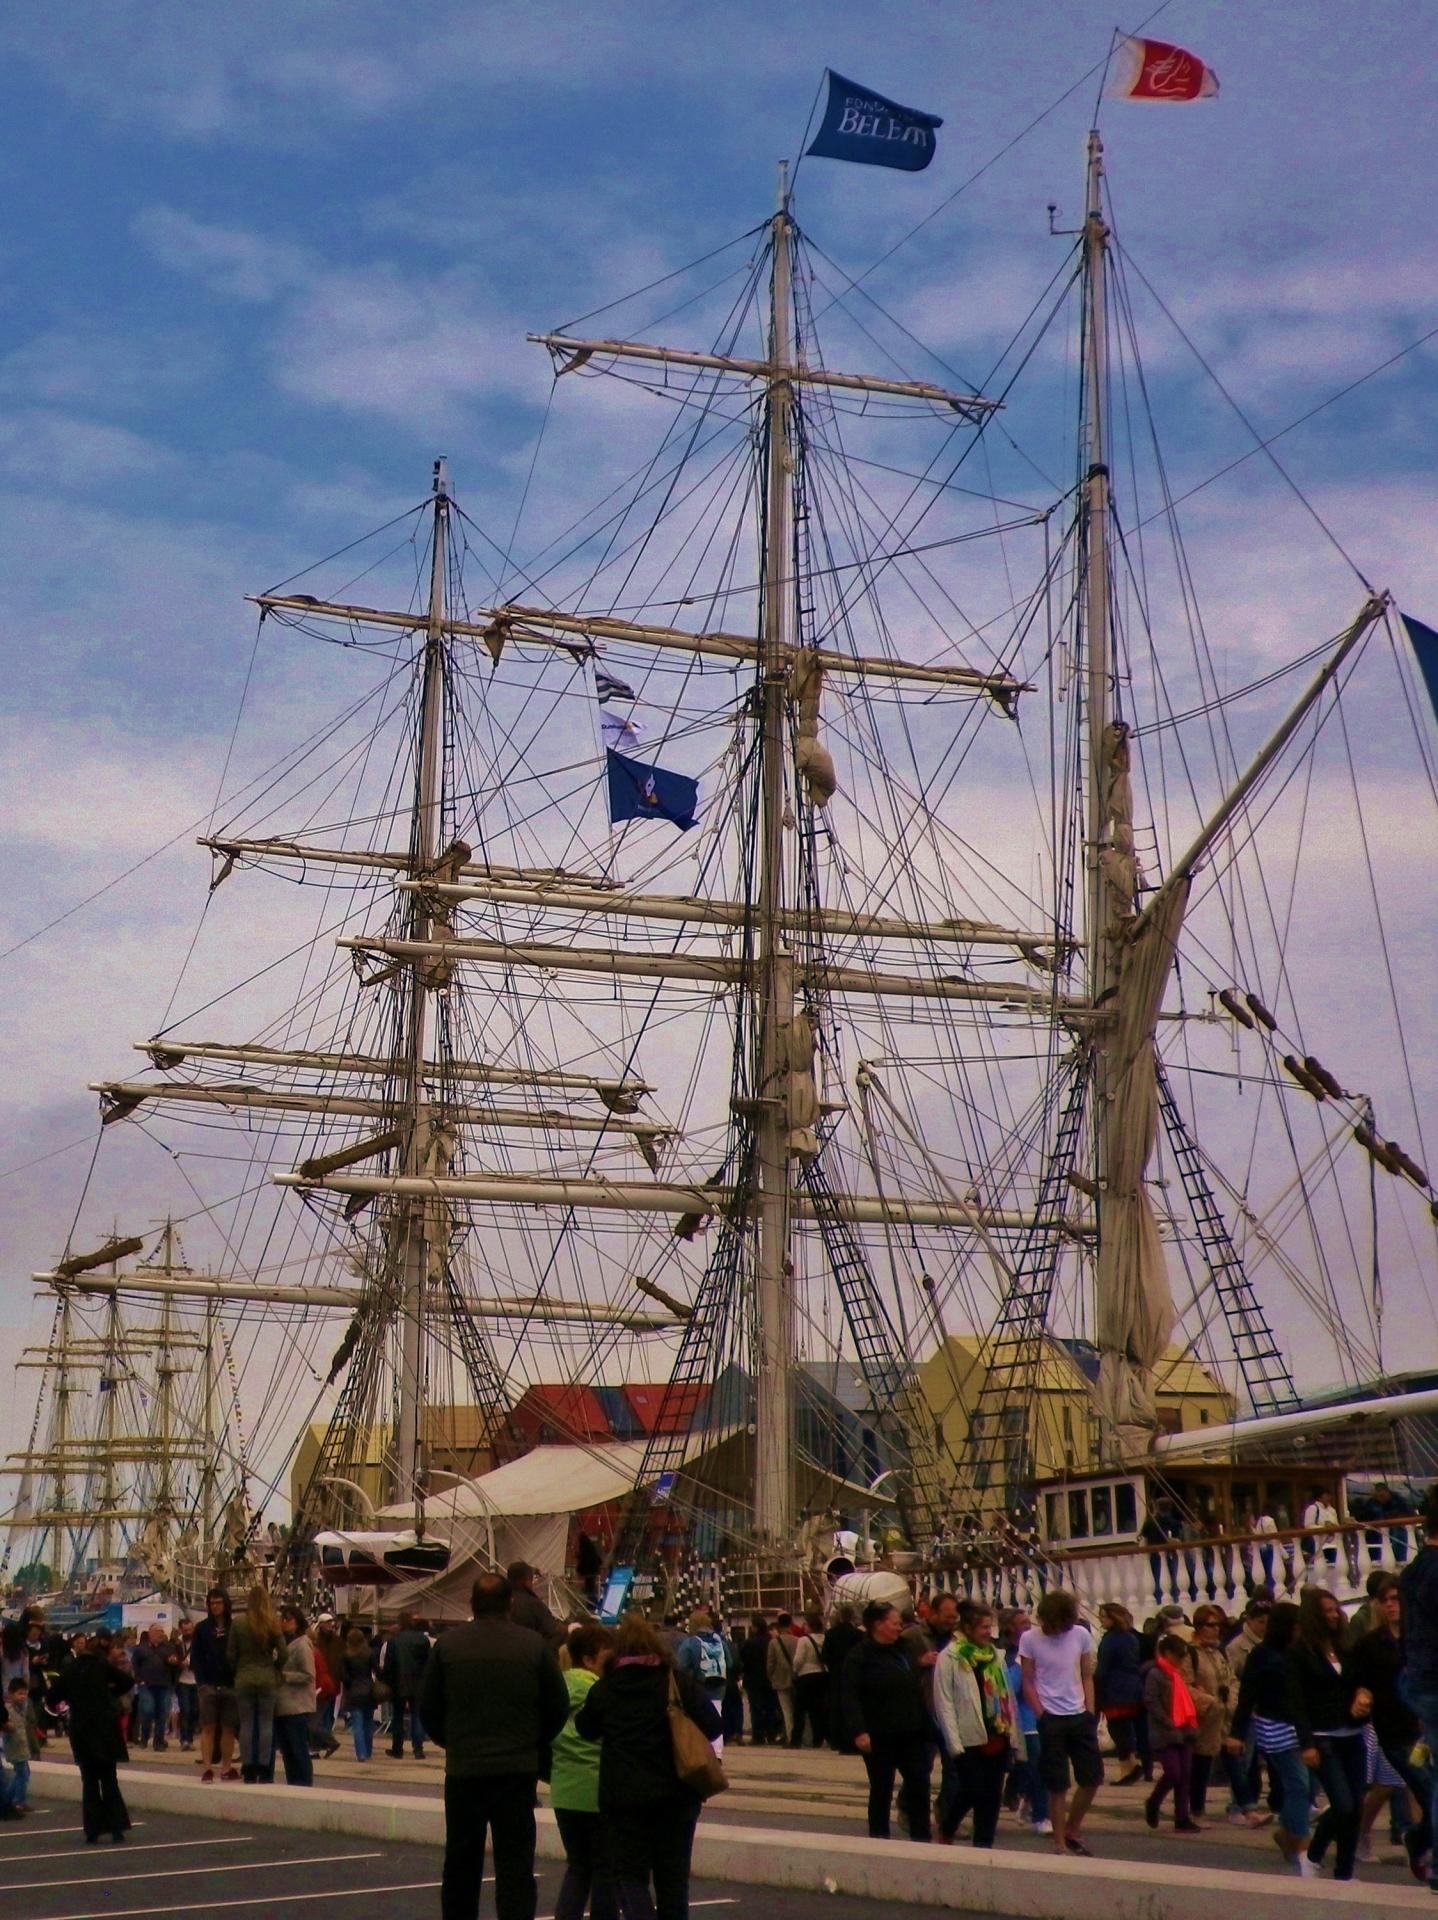 Grande fete maritime de Dunkerque